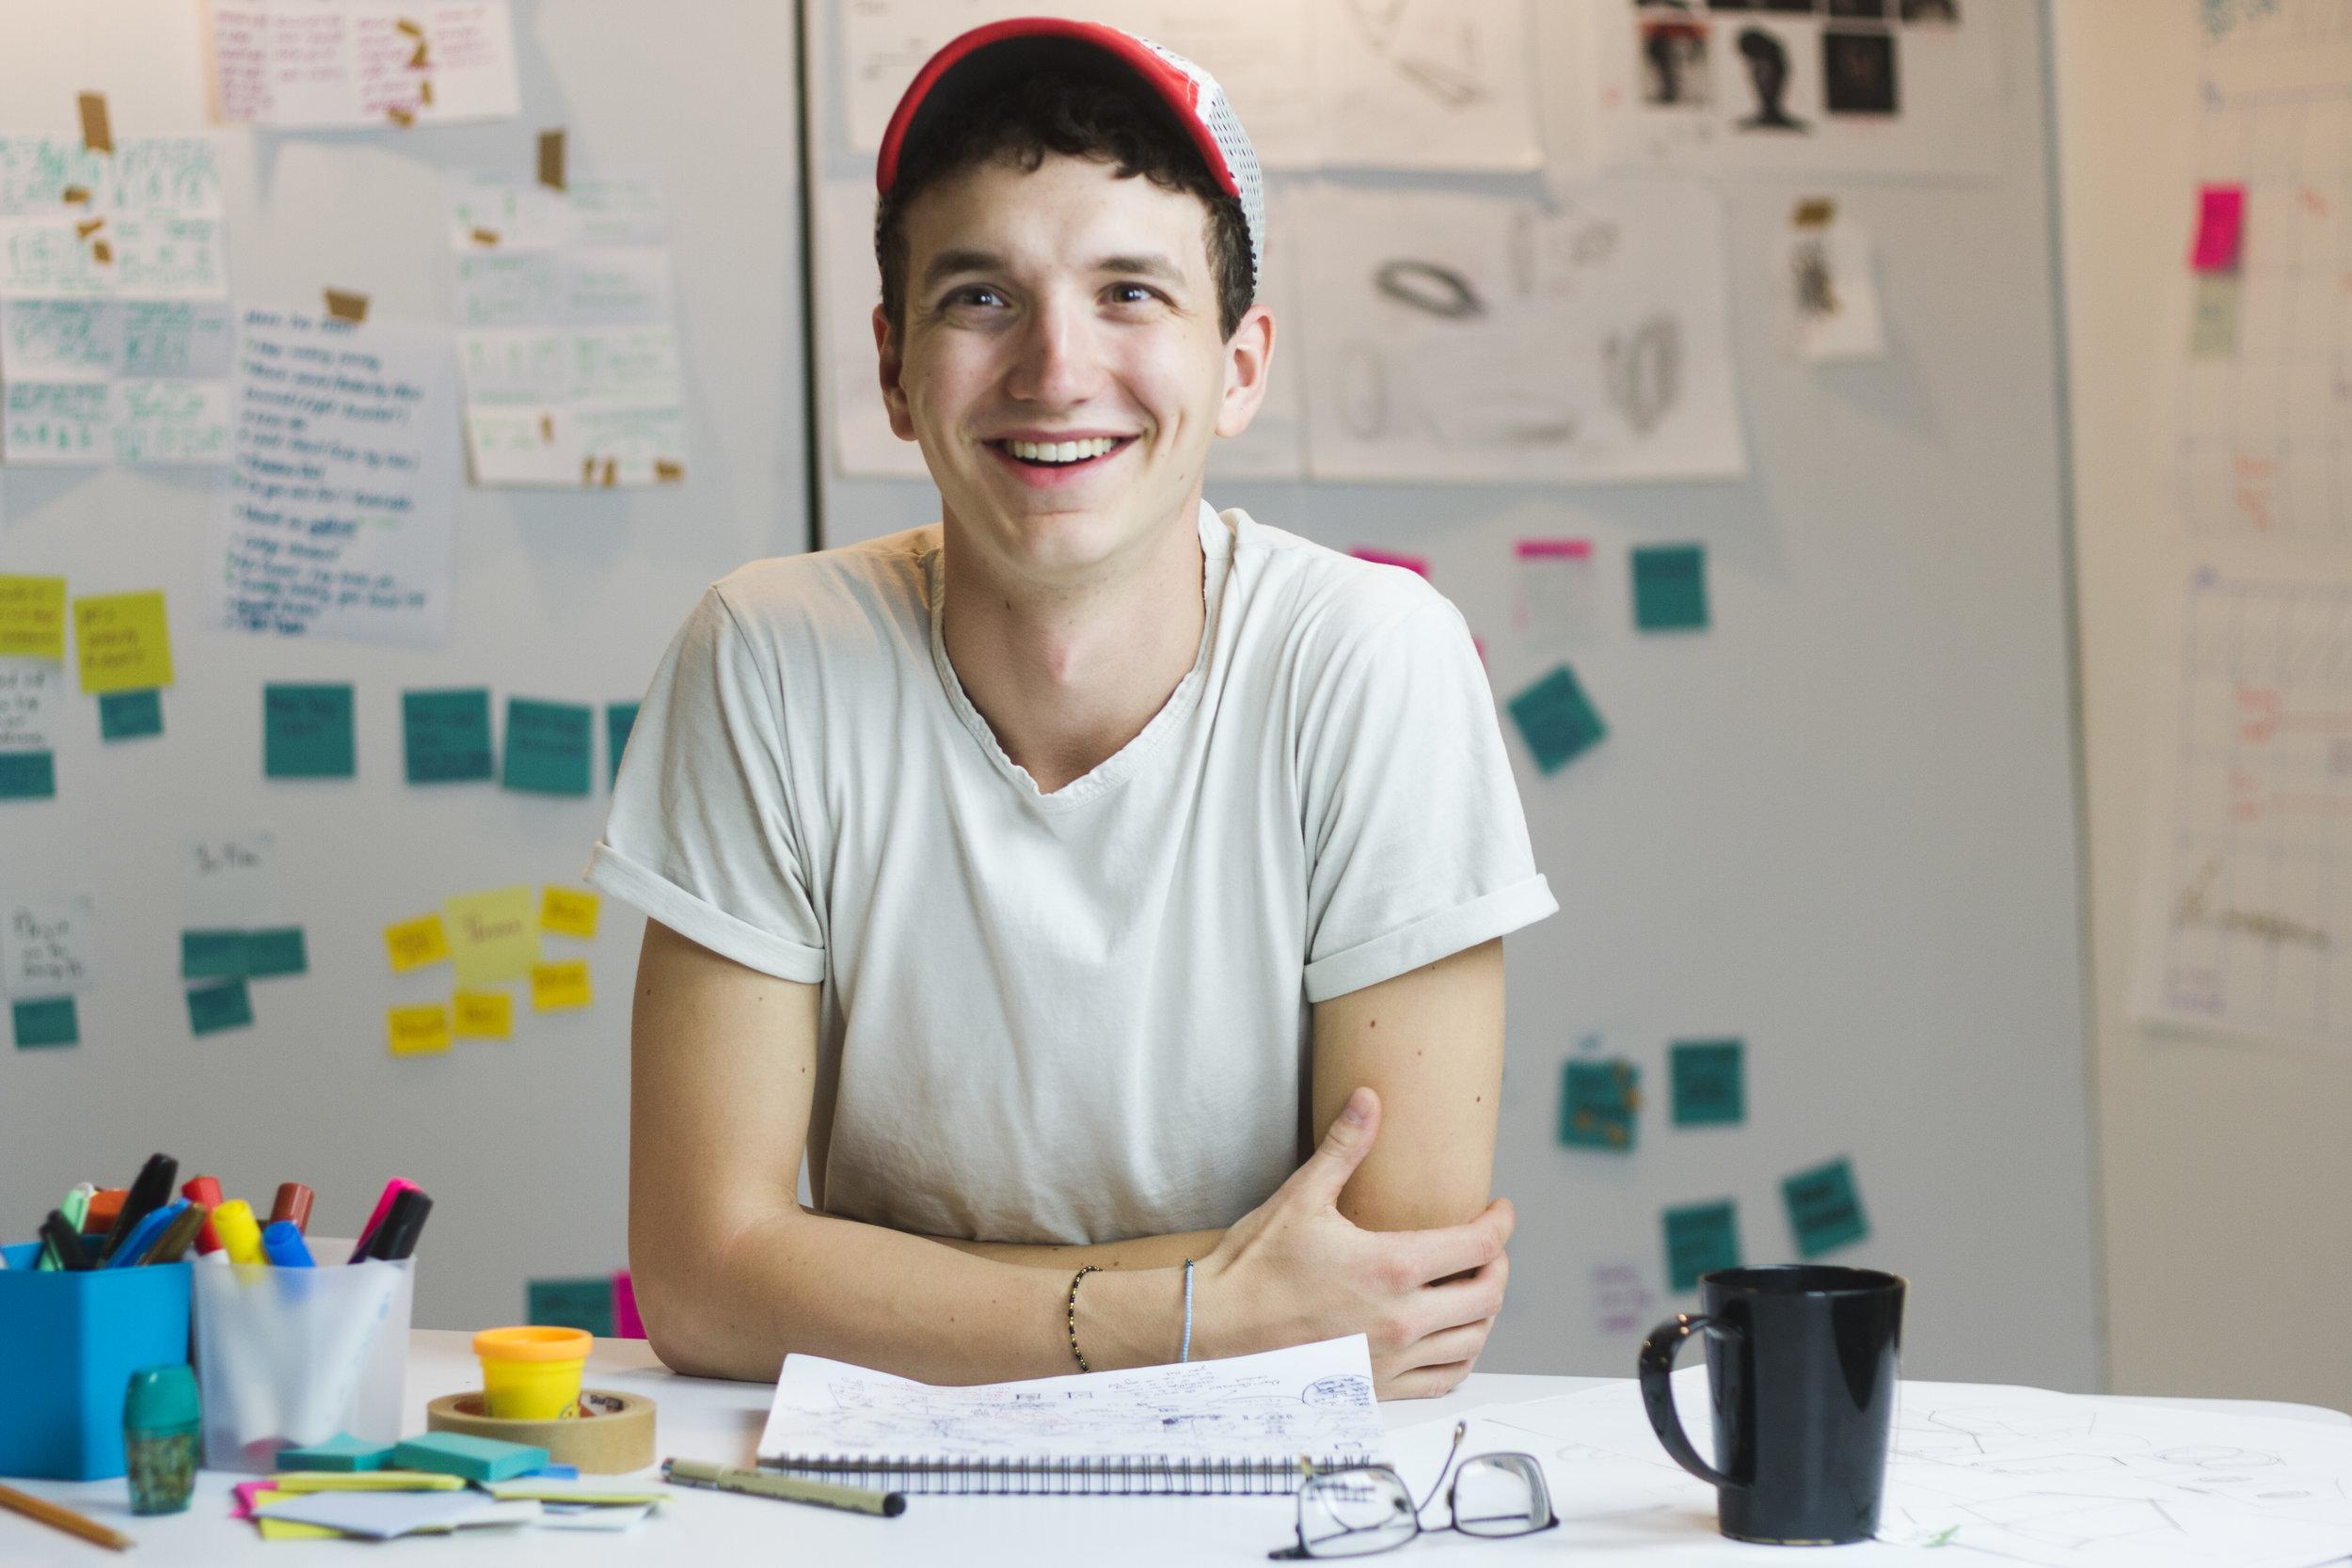 Jacob Morgan - Designer, Photographer